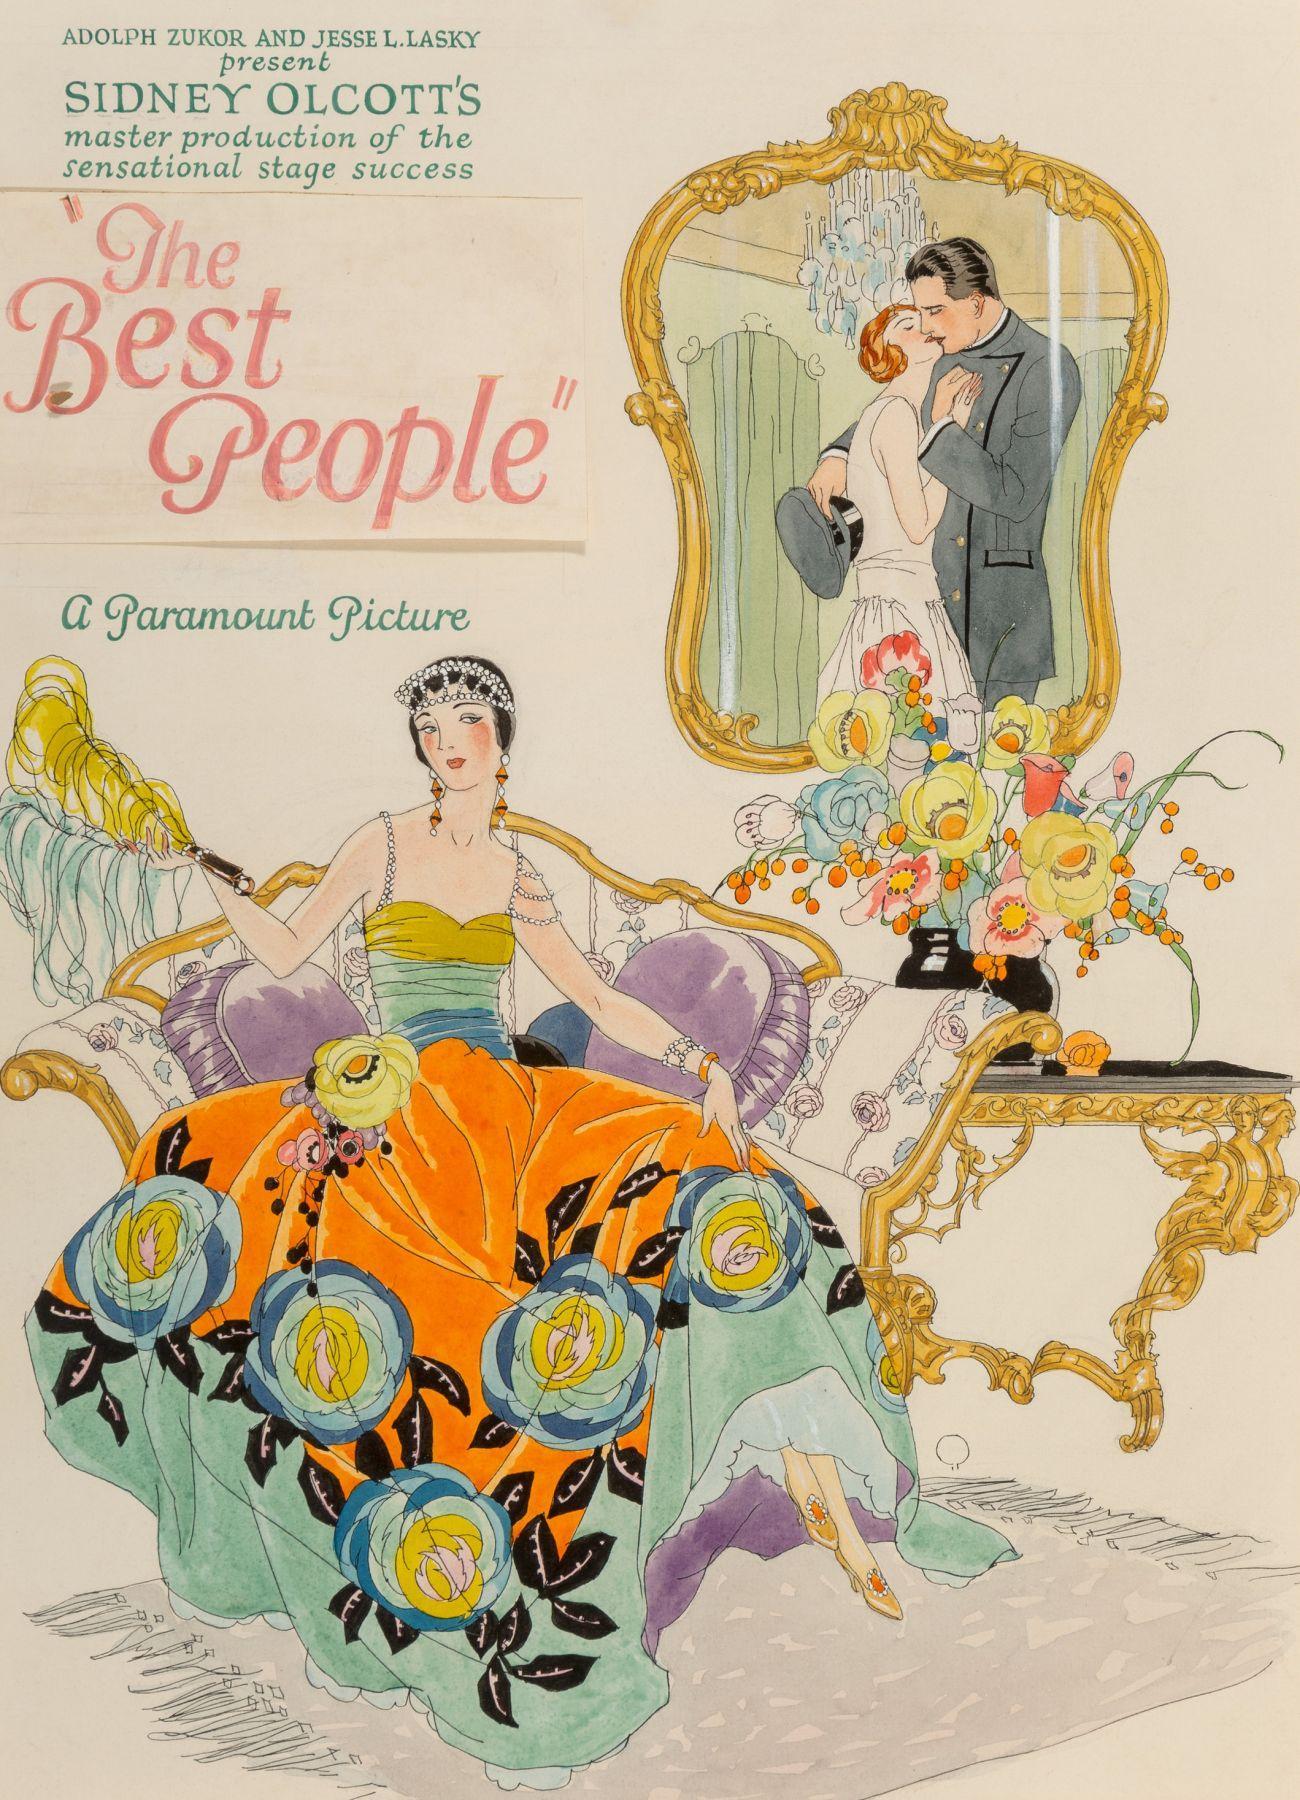 The Best People, Original Promotional Movie Illustration